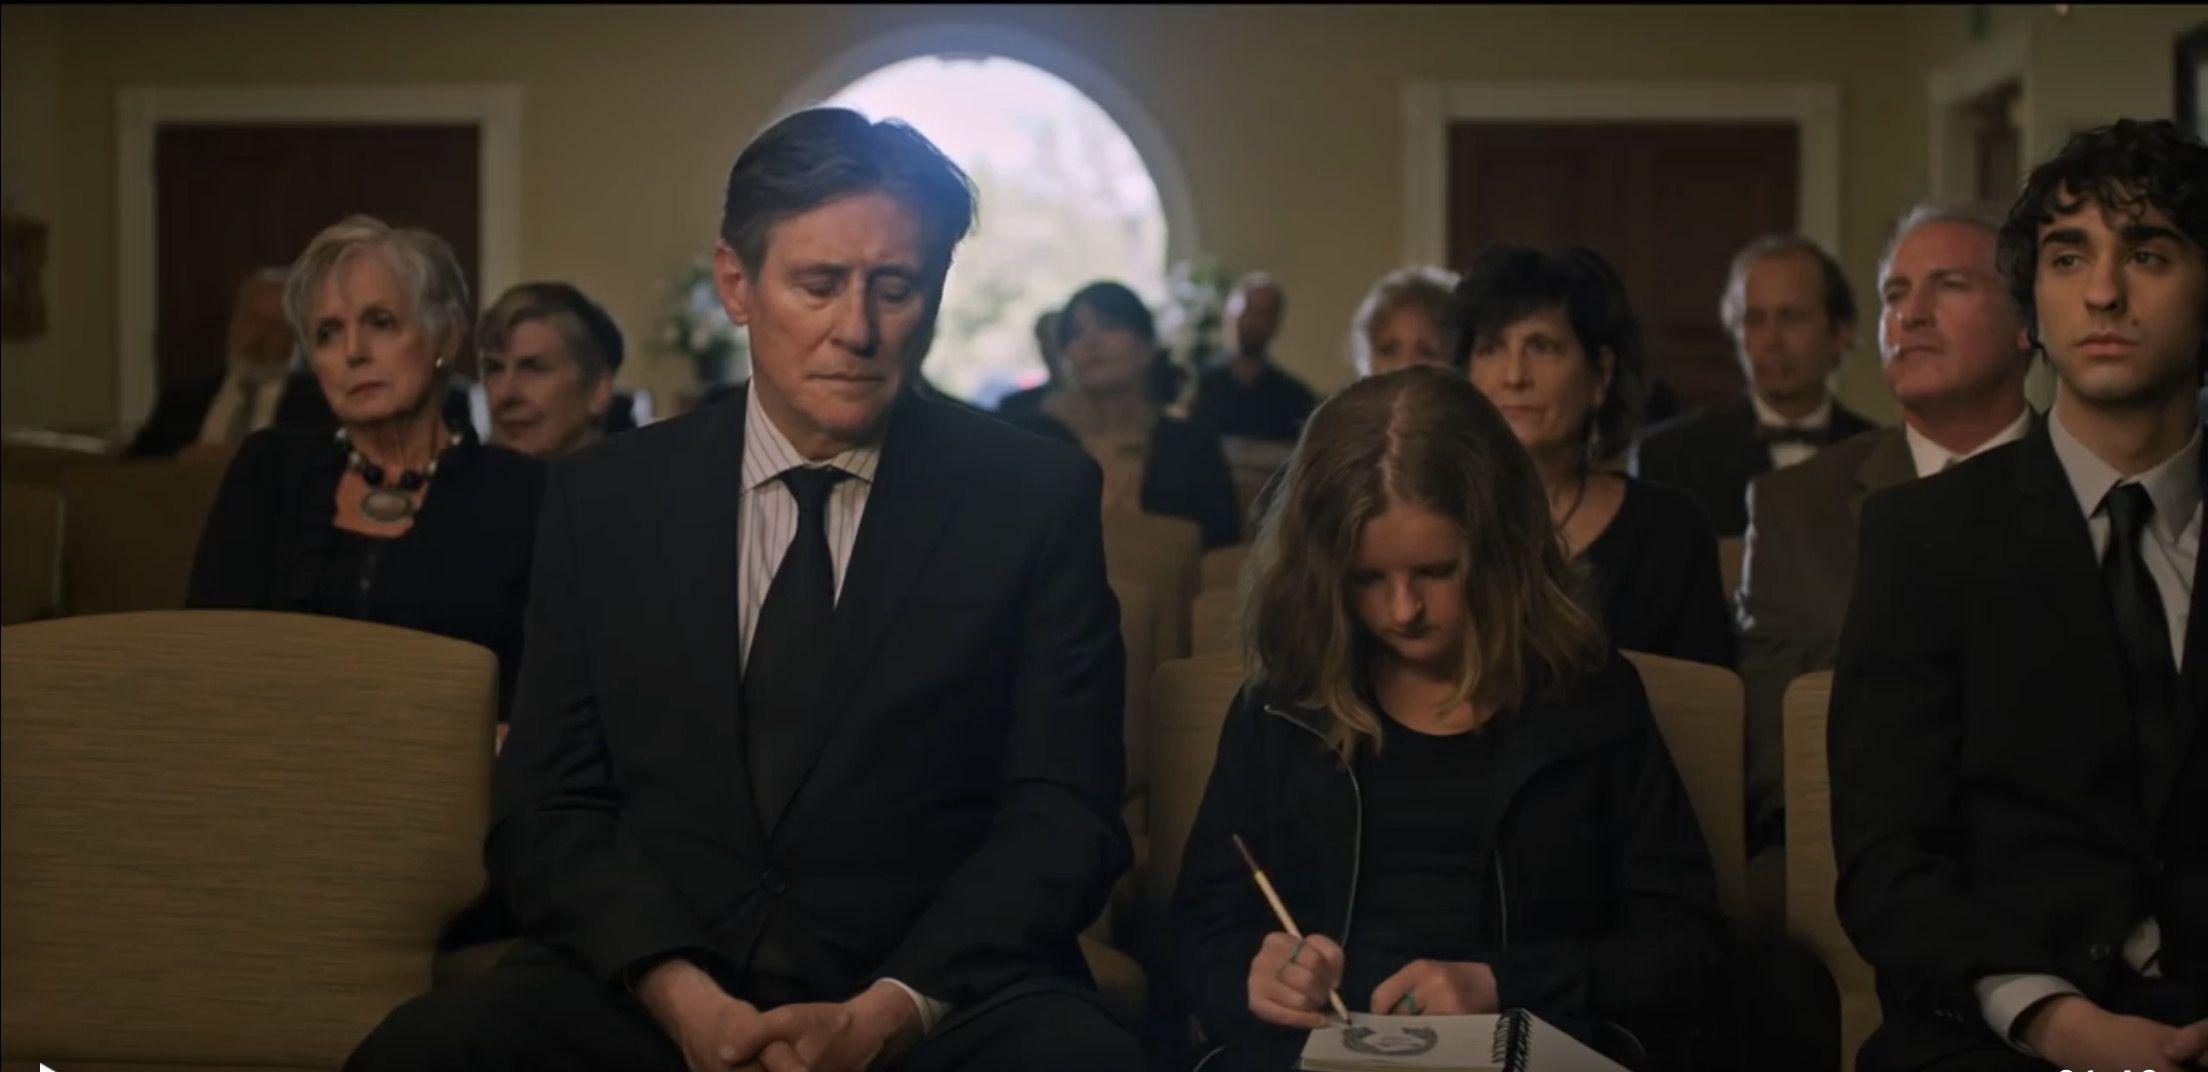 Gabriel Byrne, Milly Shapiro, and Alex Wolff in Hereditary